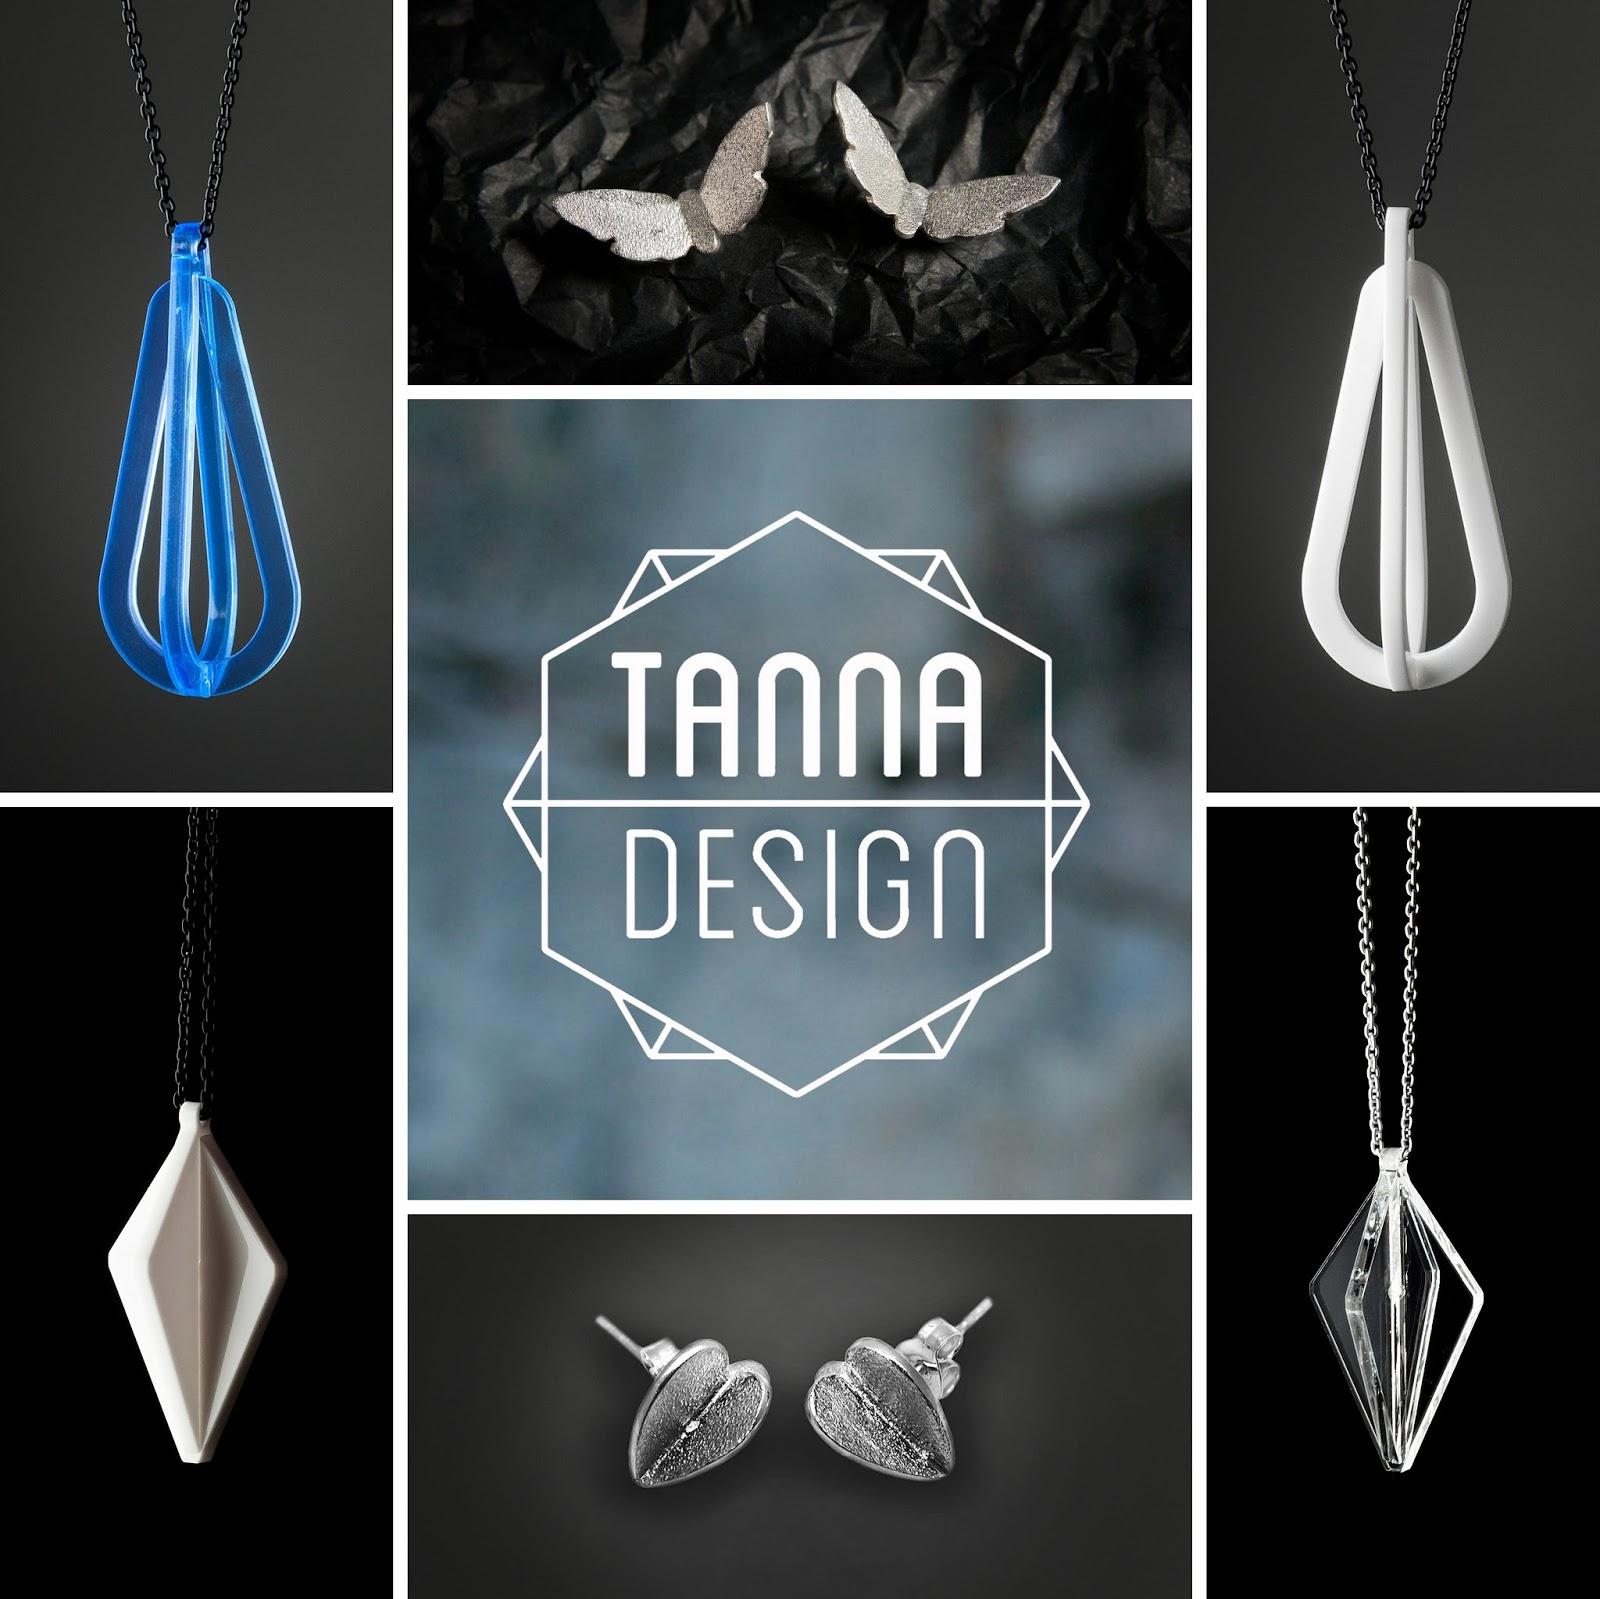 id tanna design